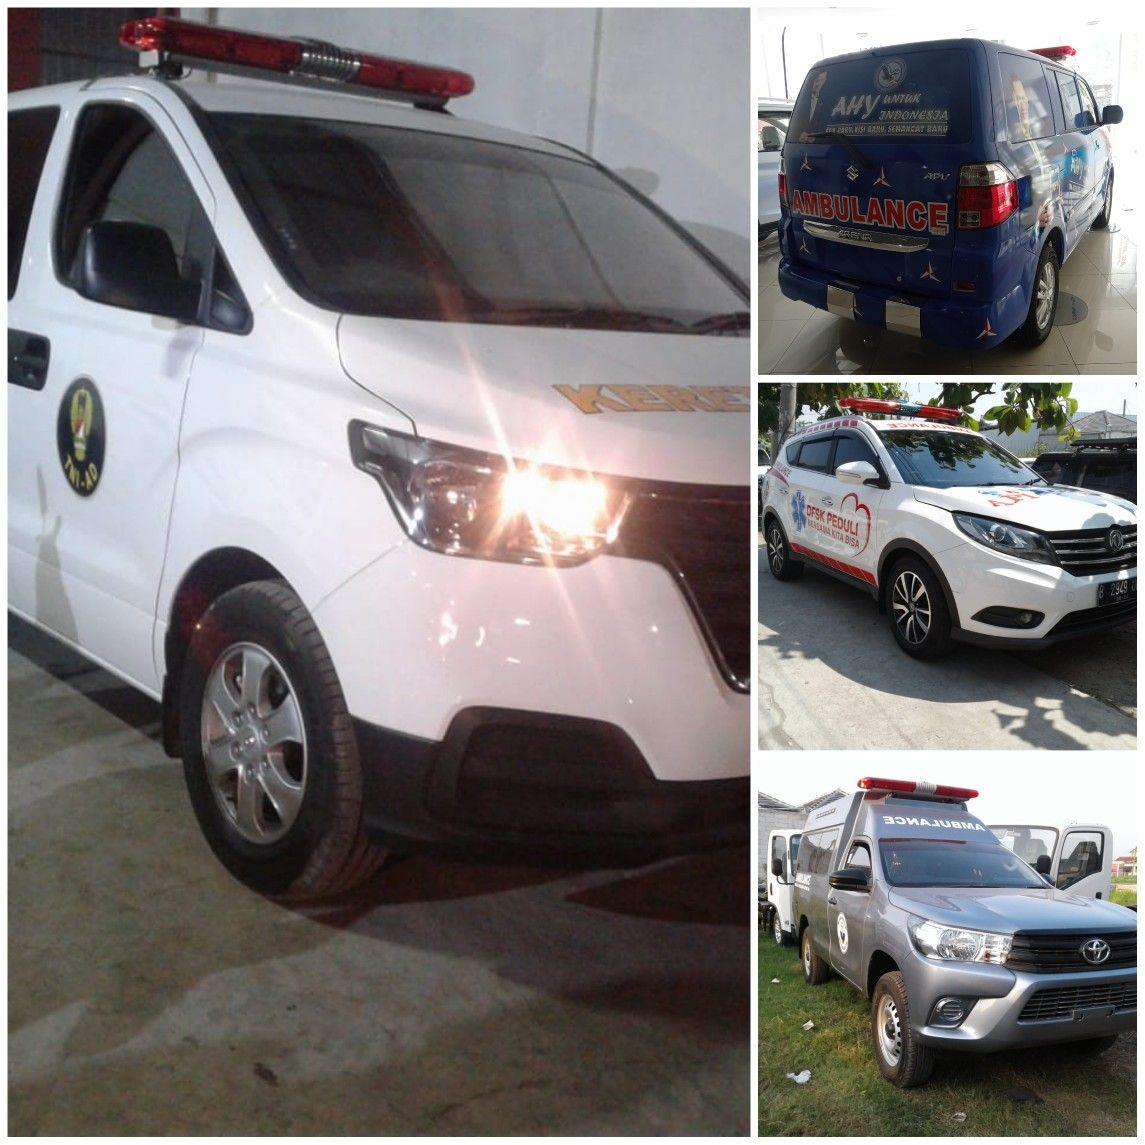 Pin Oleh Andre Hidayat Di Produk Karoseri Ambulance 70 085925340494ance